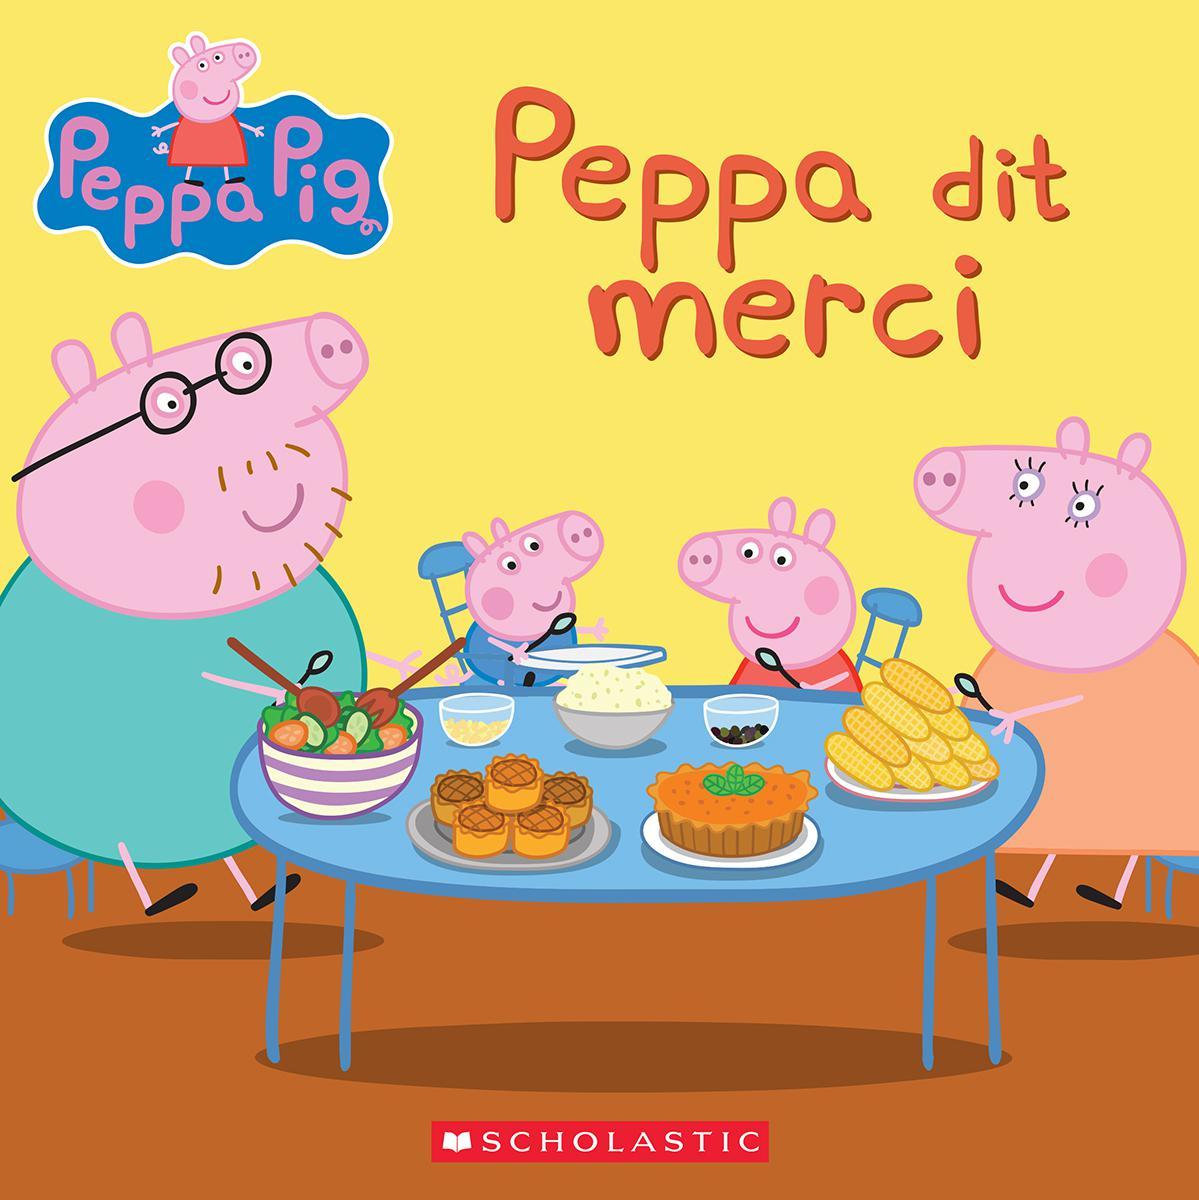 Peppa Pig : Peppa dit merci